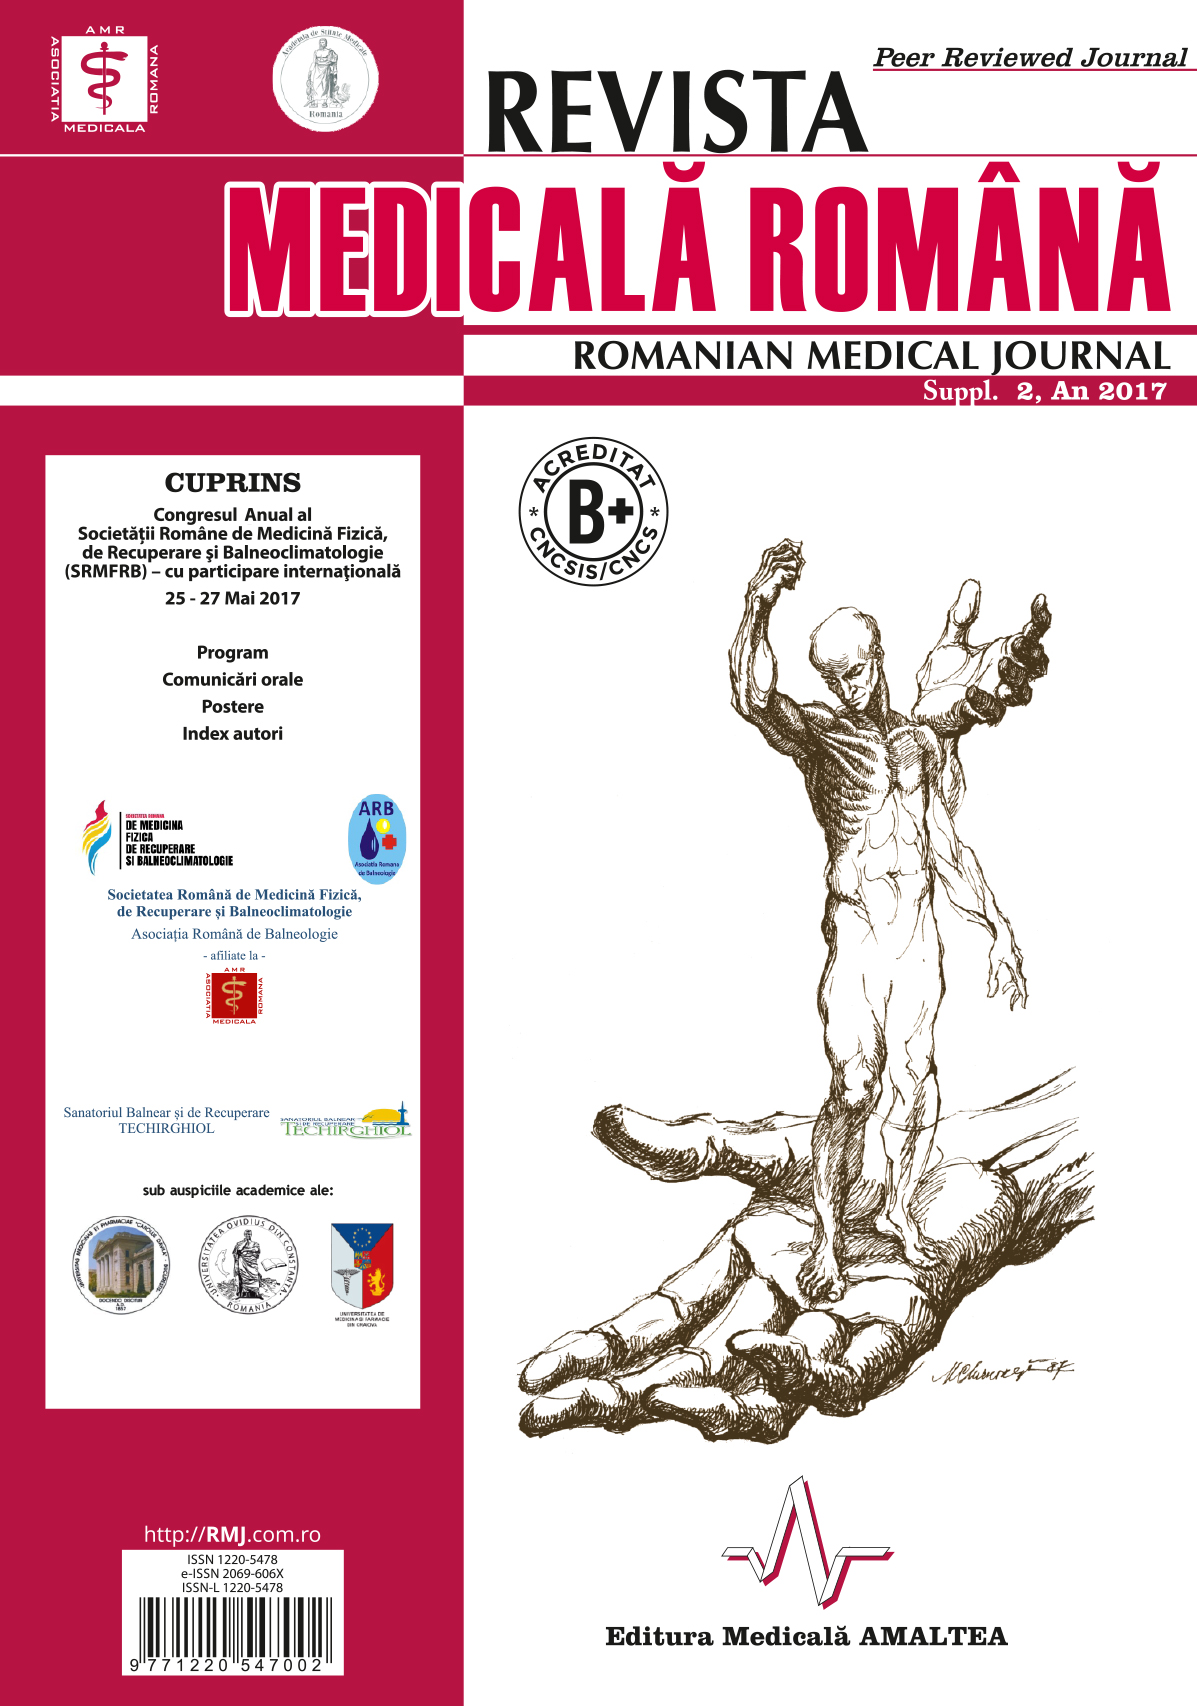 REVISTA MEDICALA ROMANA - Romanian Medical Journal, Vol. LXIV, Suppl. 2, An 2017